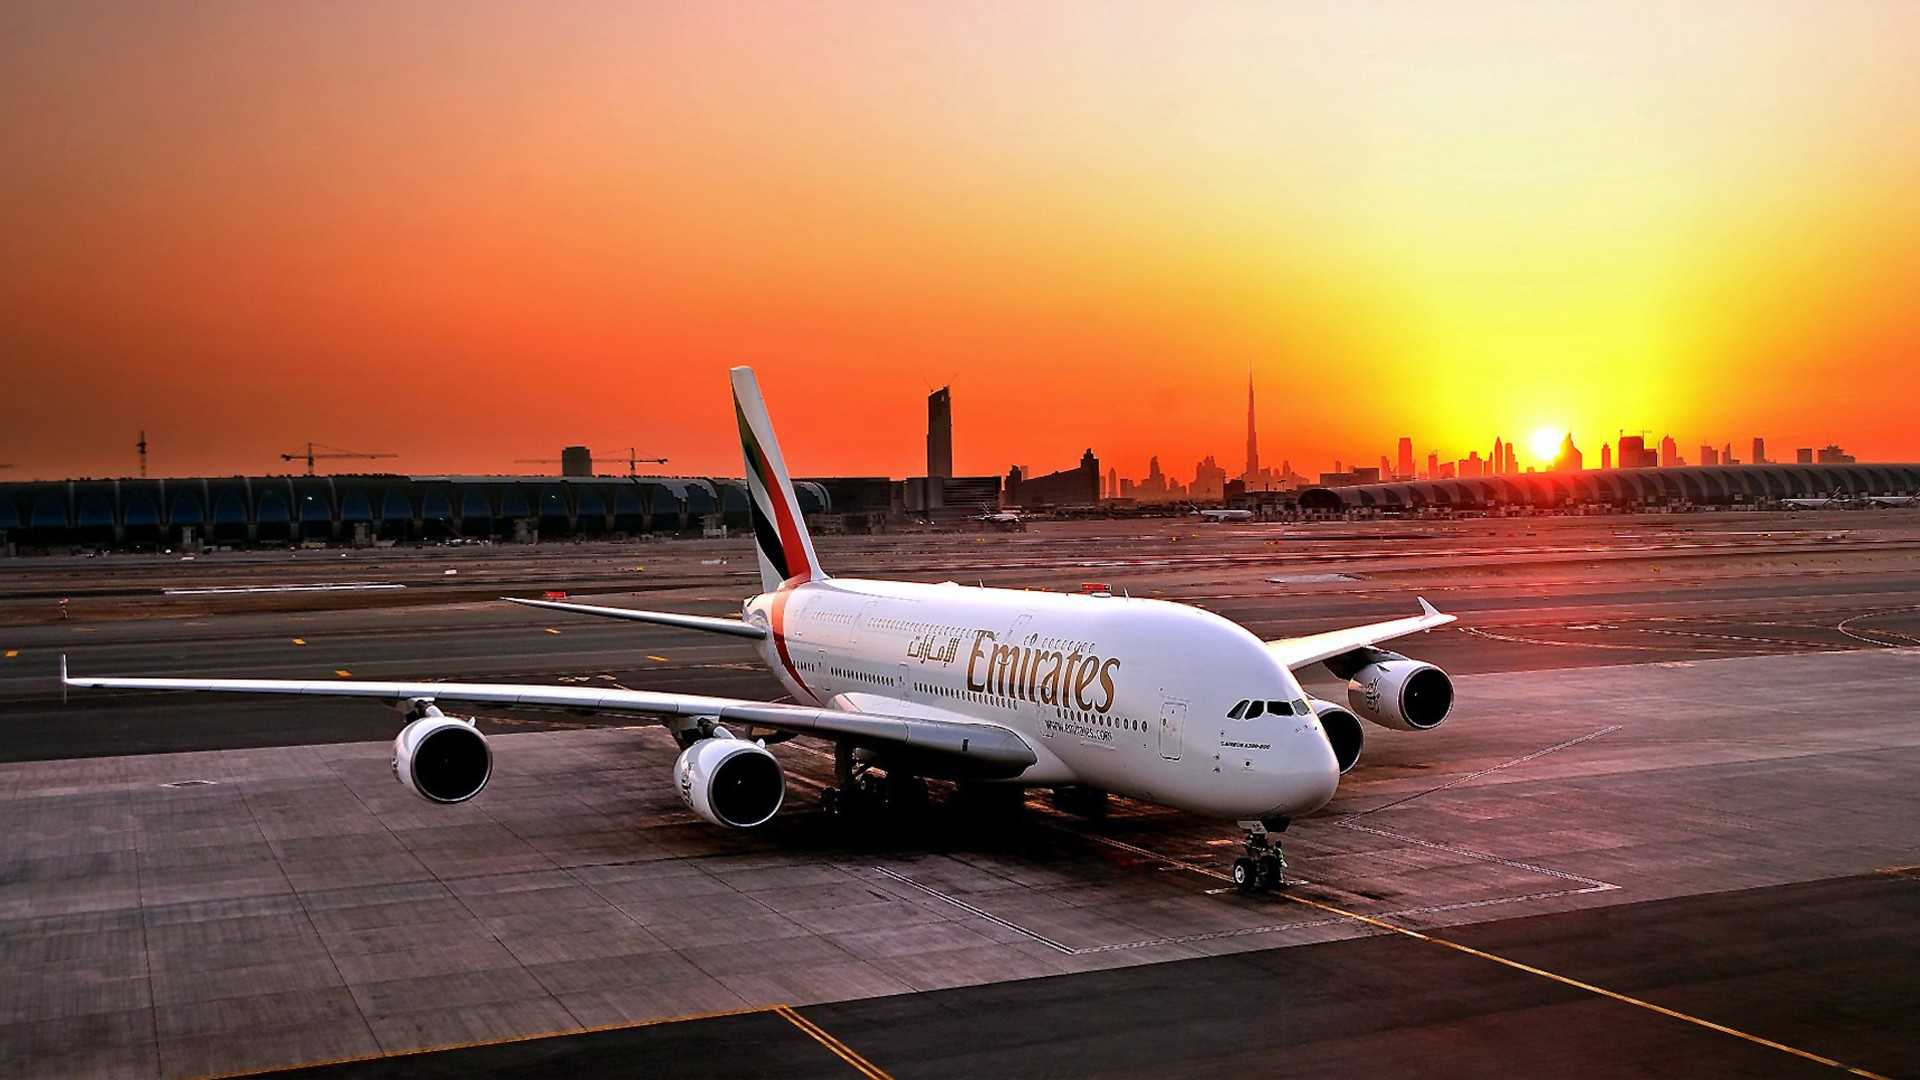 Hd Desktop Arab Emirates Plane Airport Wallpapers Donwload 1920x1080